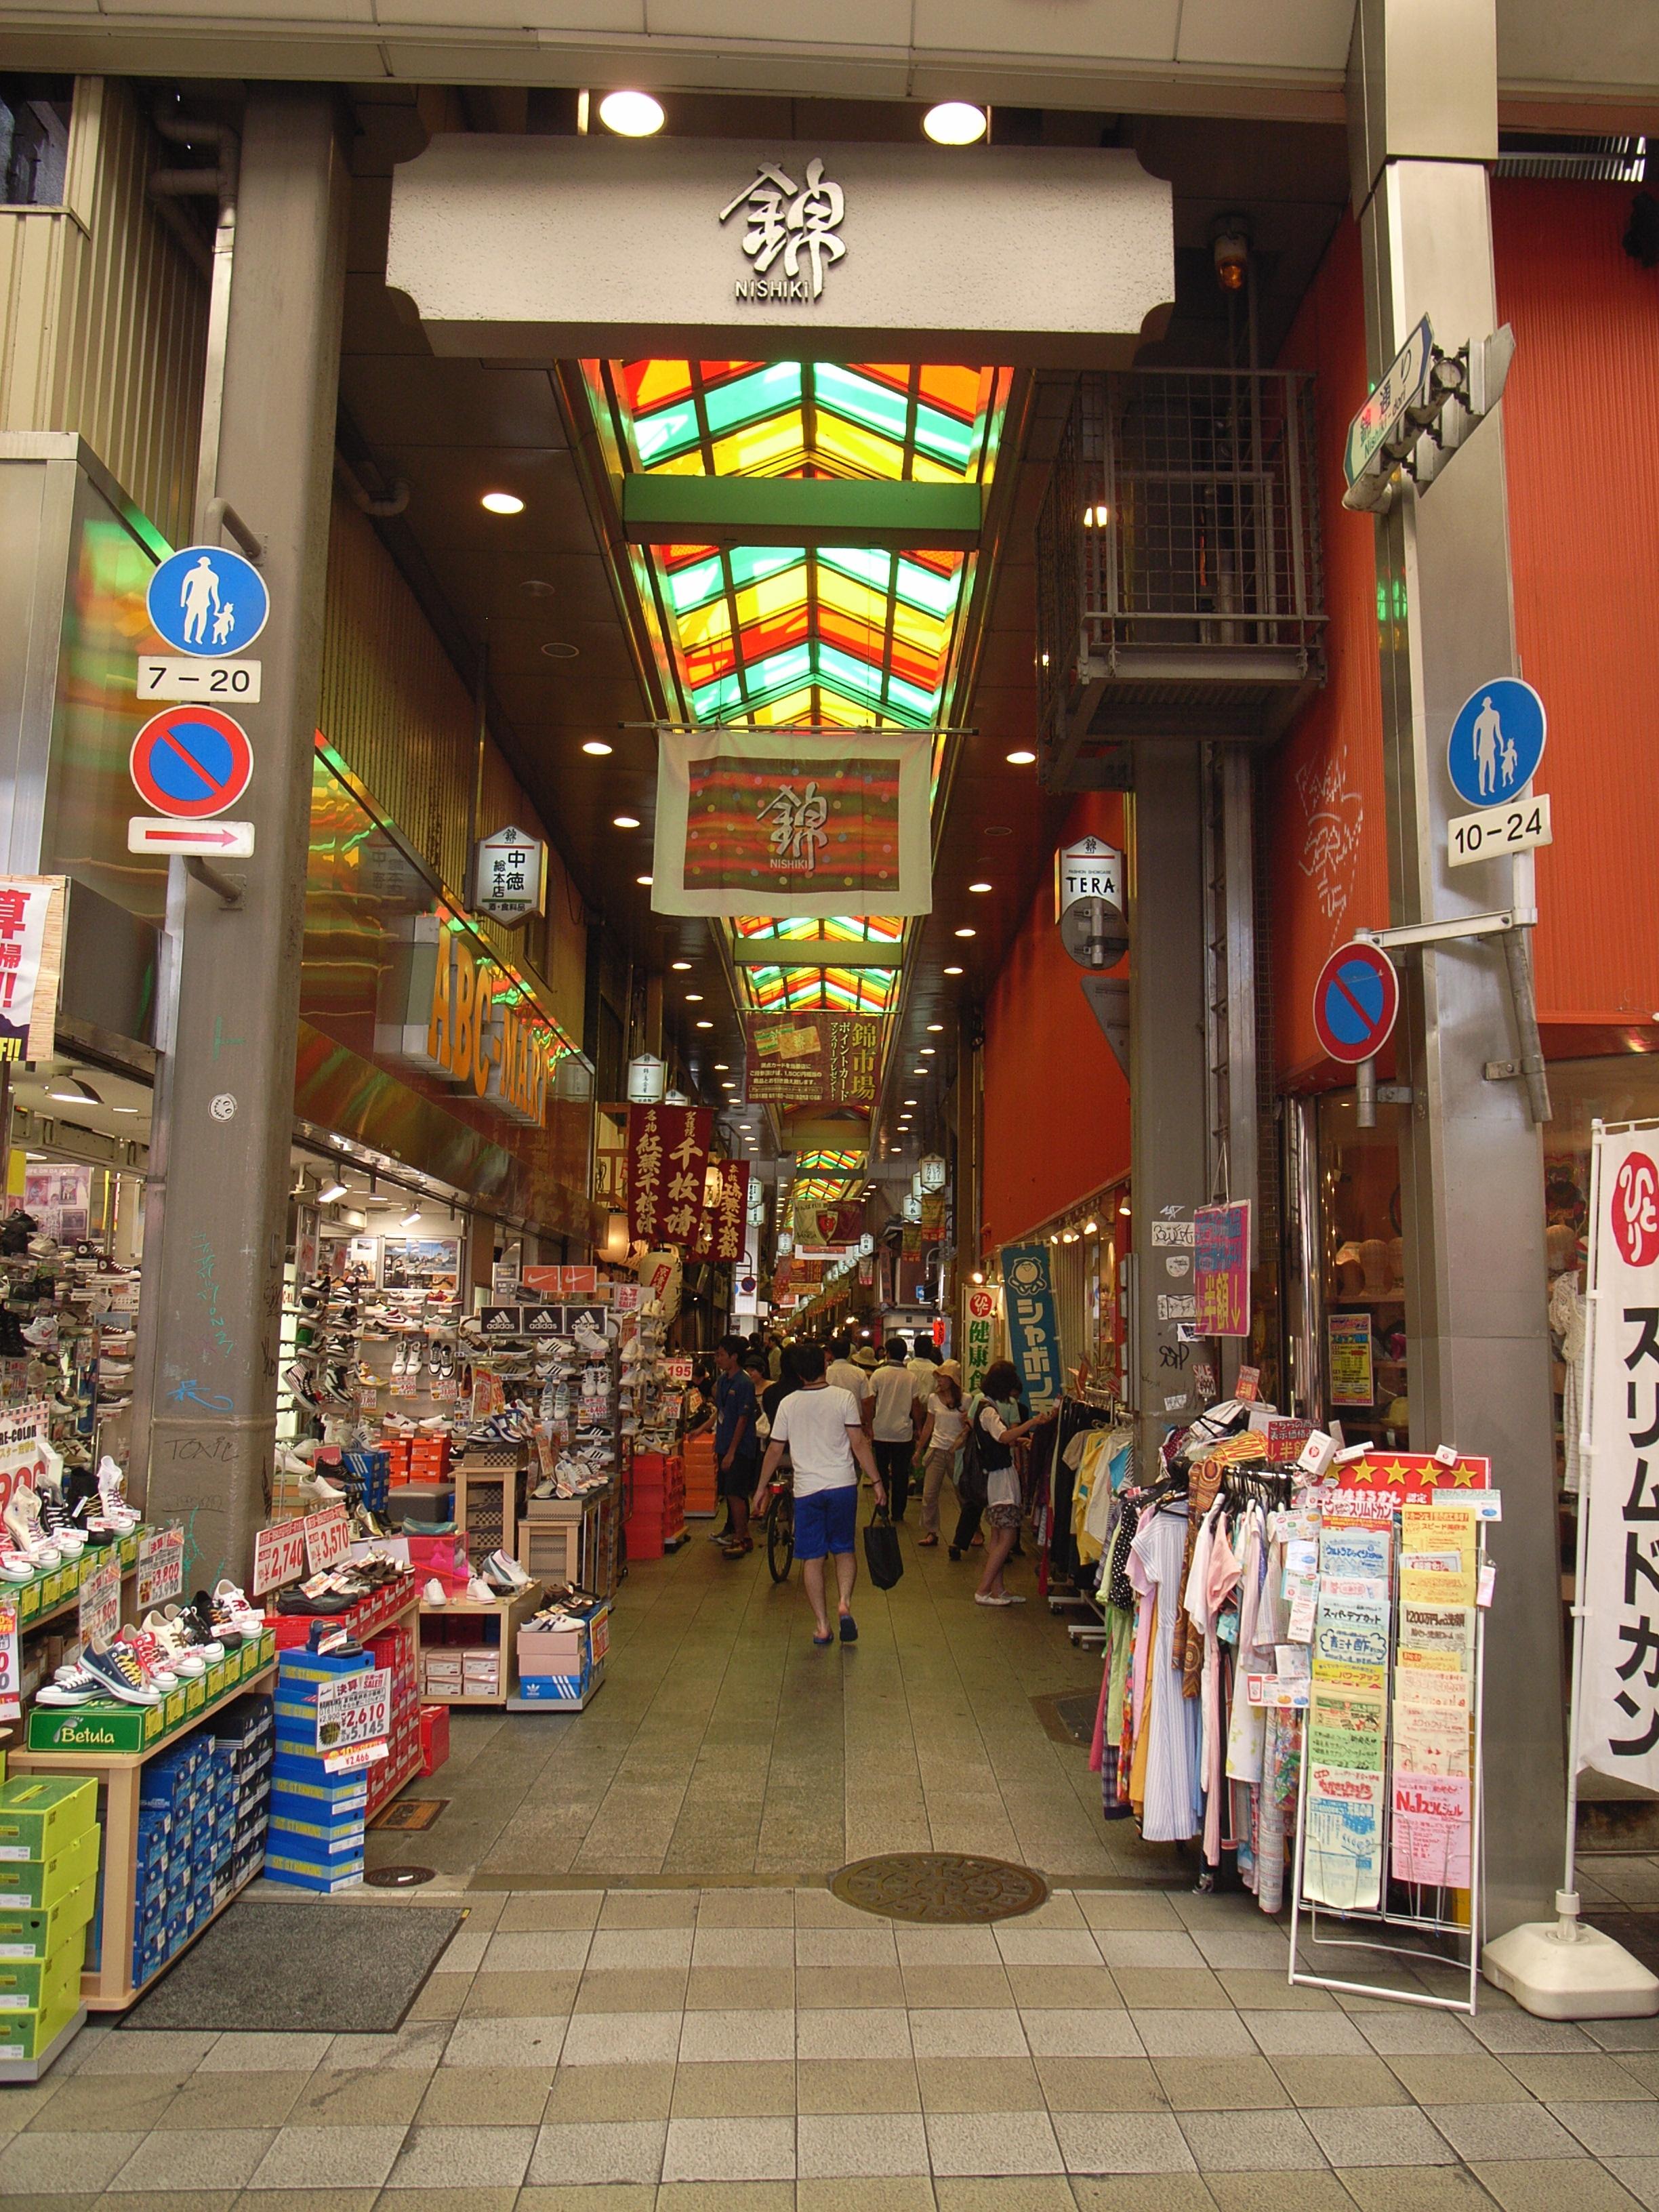 http://upload.wikimedia.org/wikipedia/commons/c/ce/Nishiki_Ichiba_by_matsuyuki.jpg